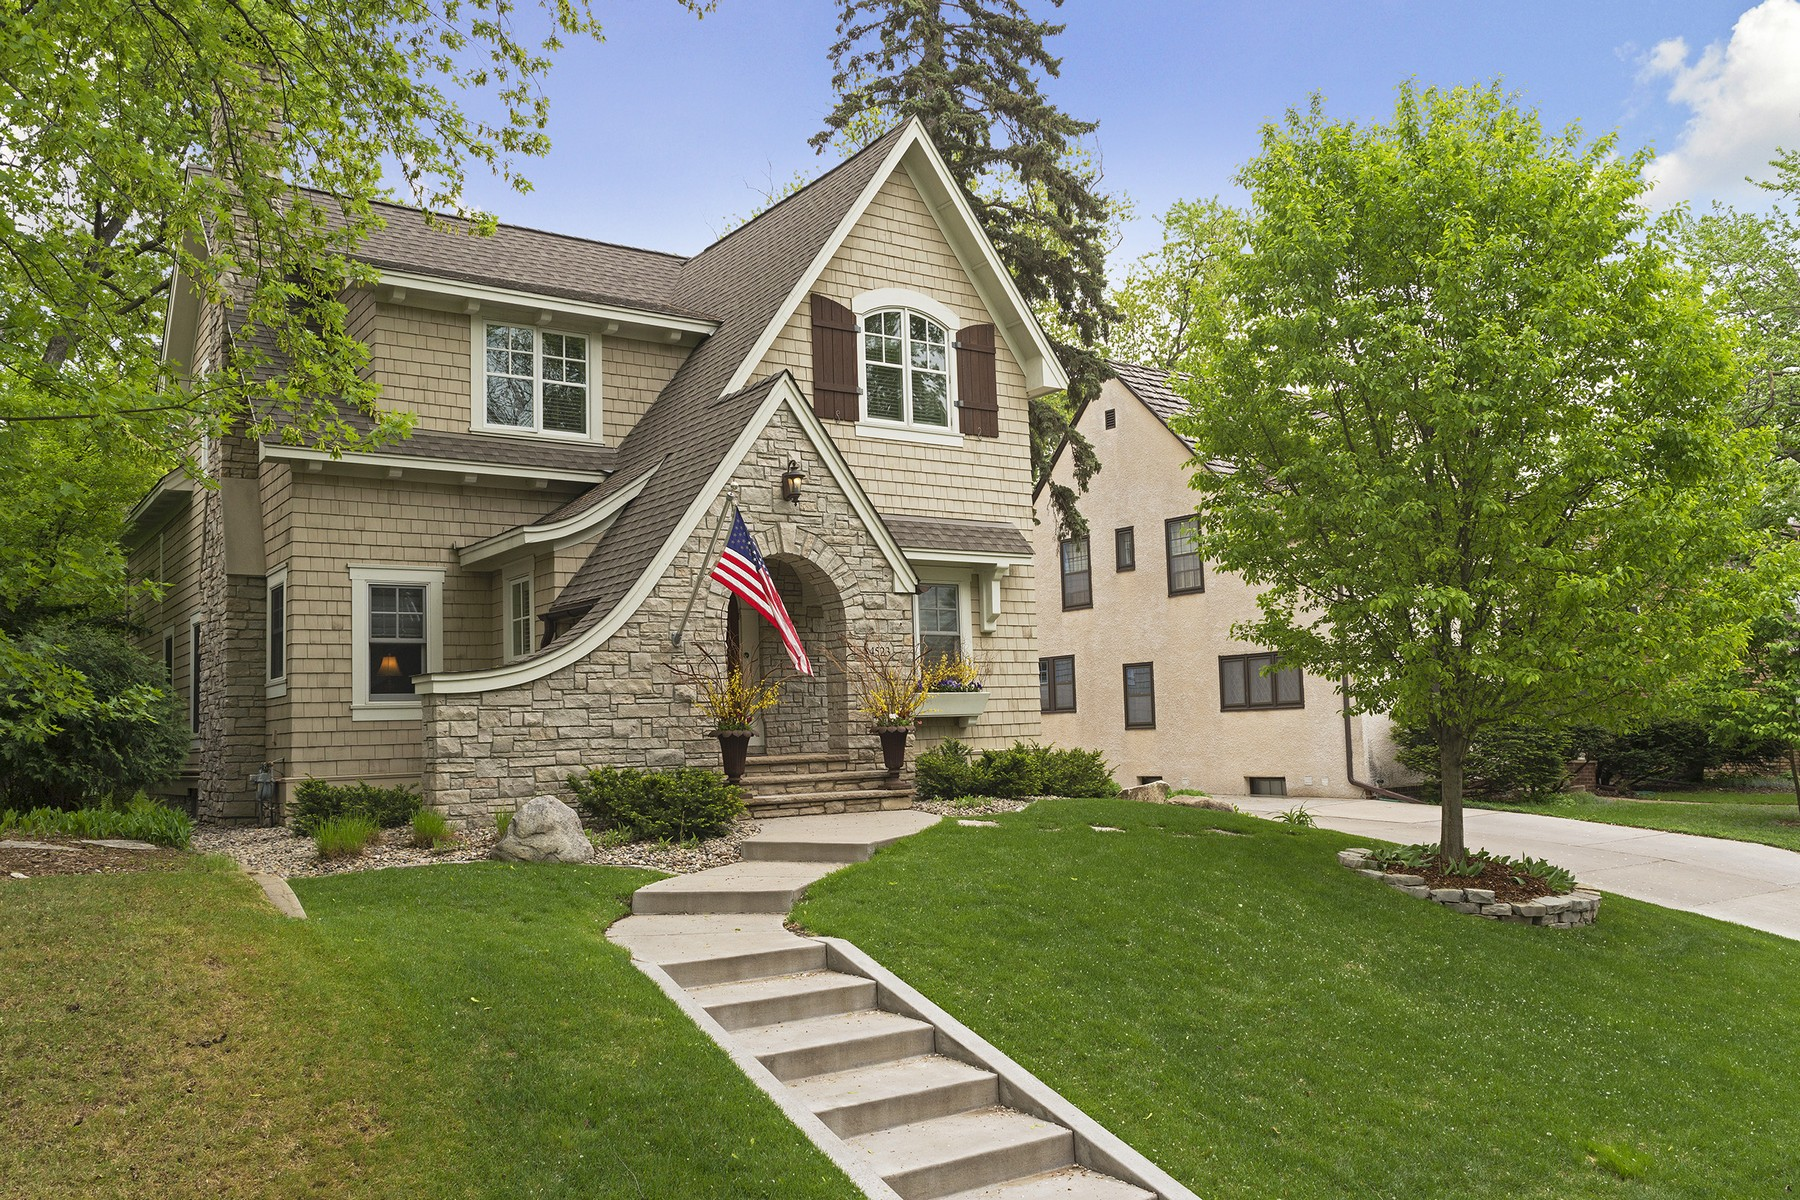 Single Family Home for Sale at 4523 Arden Avenue Edina, Minnesota 55424 United States